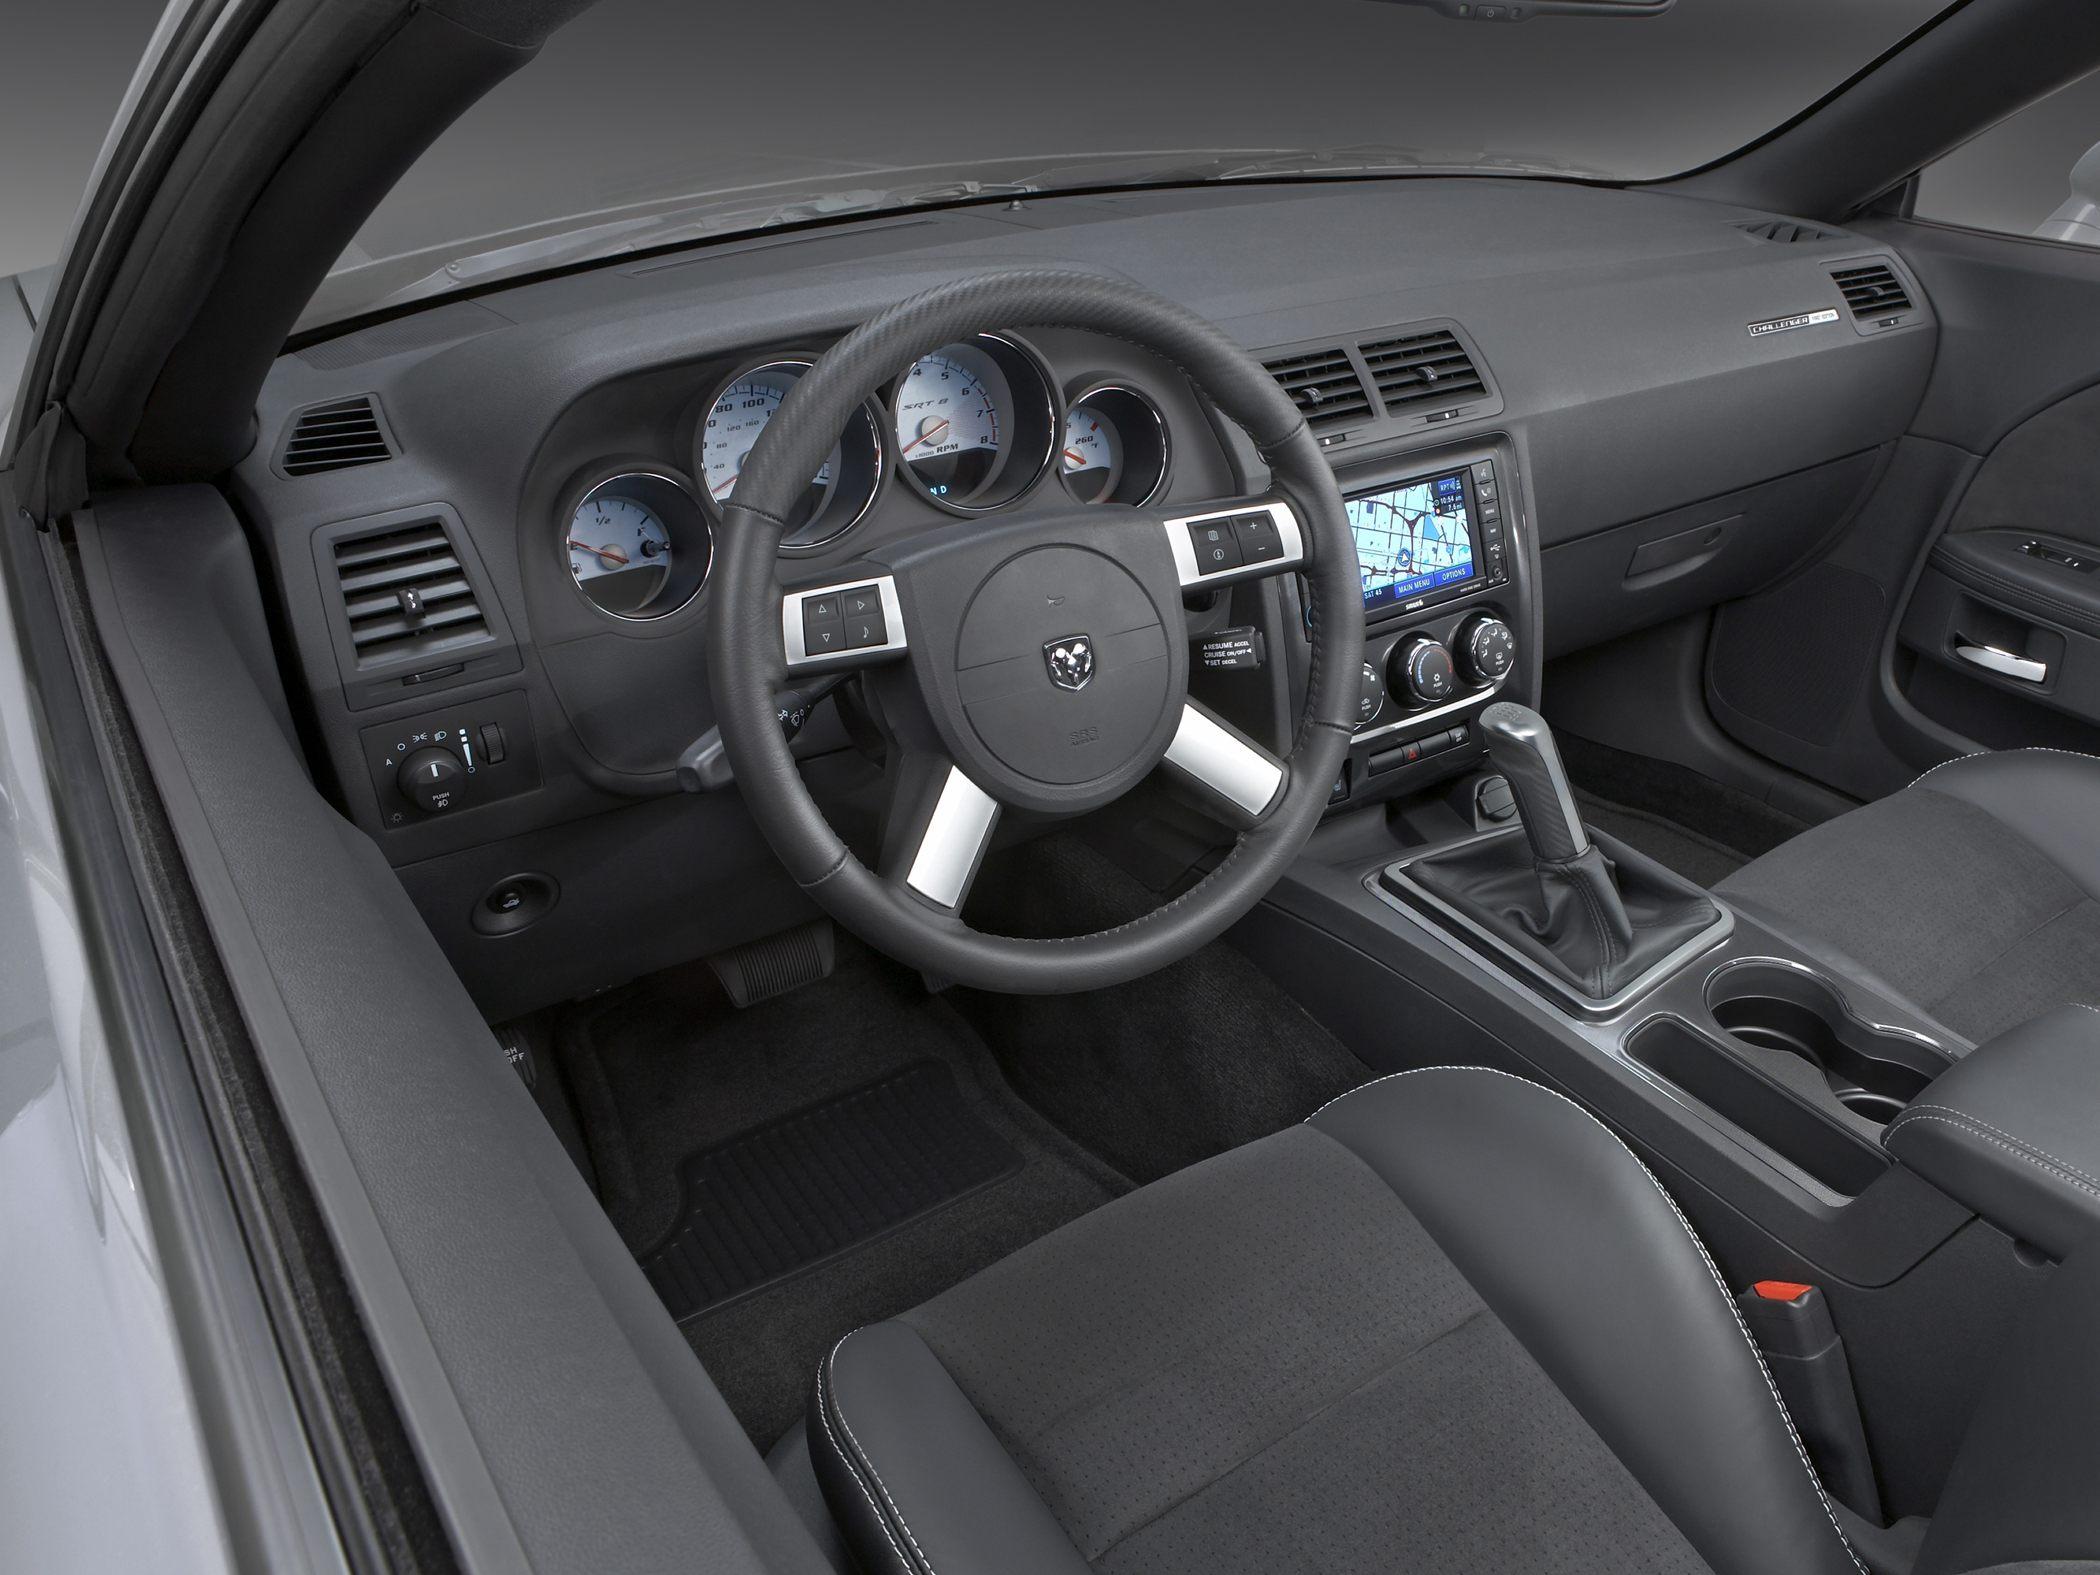 2010 Dodge Challenger Image 15